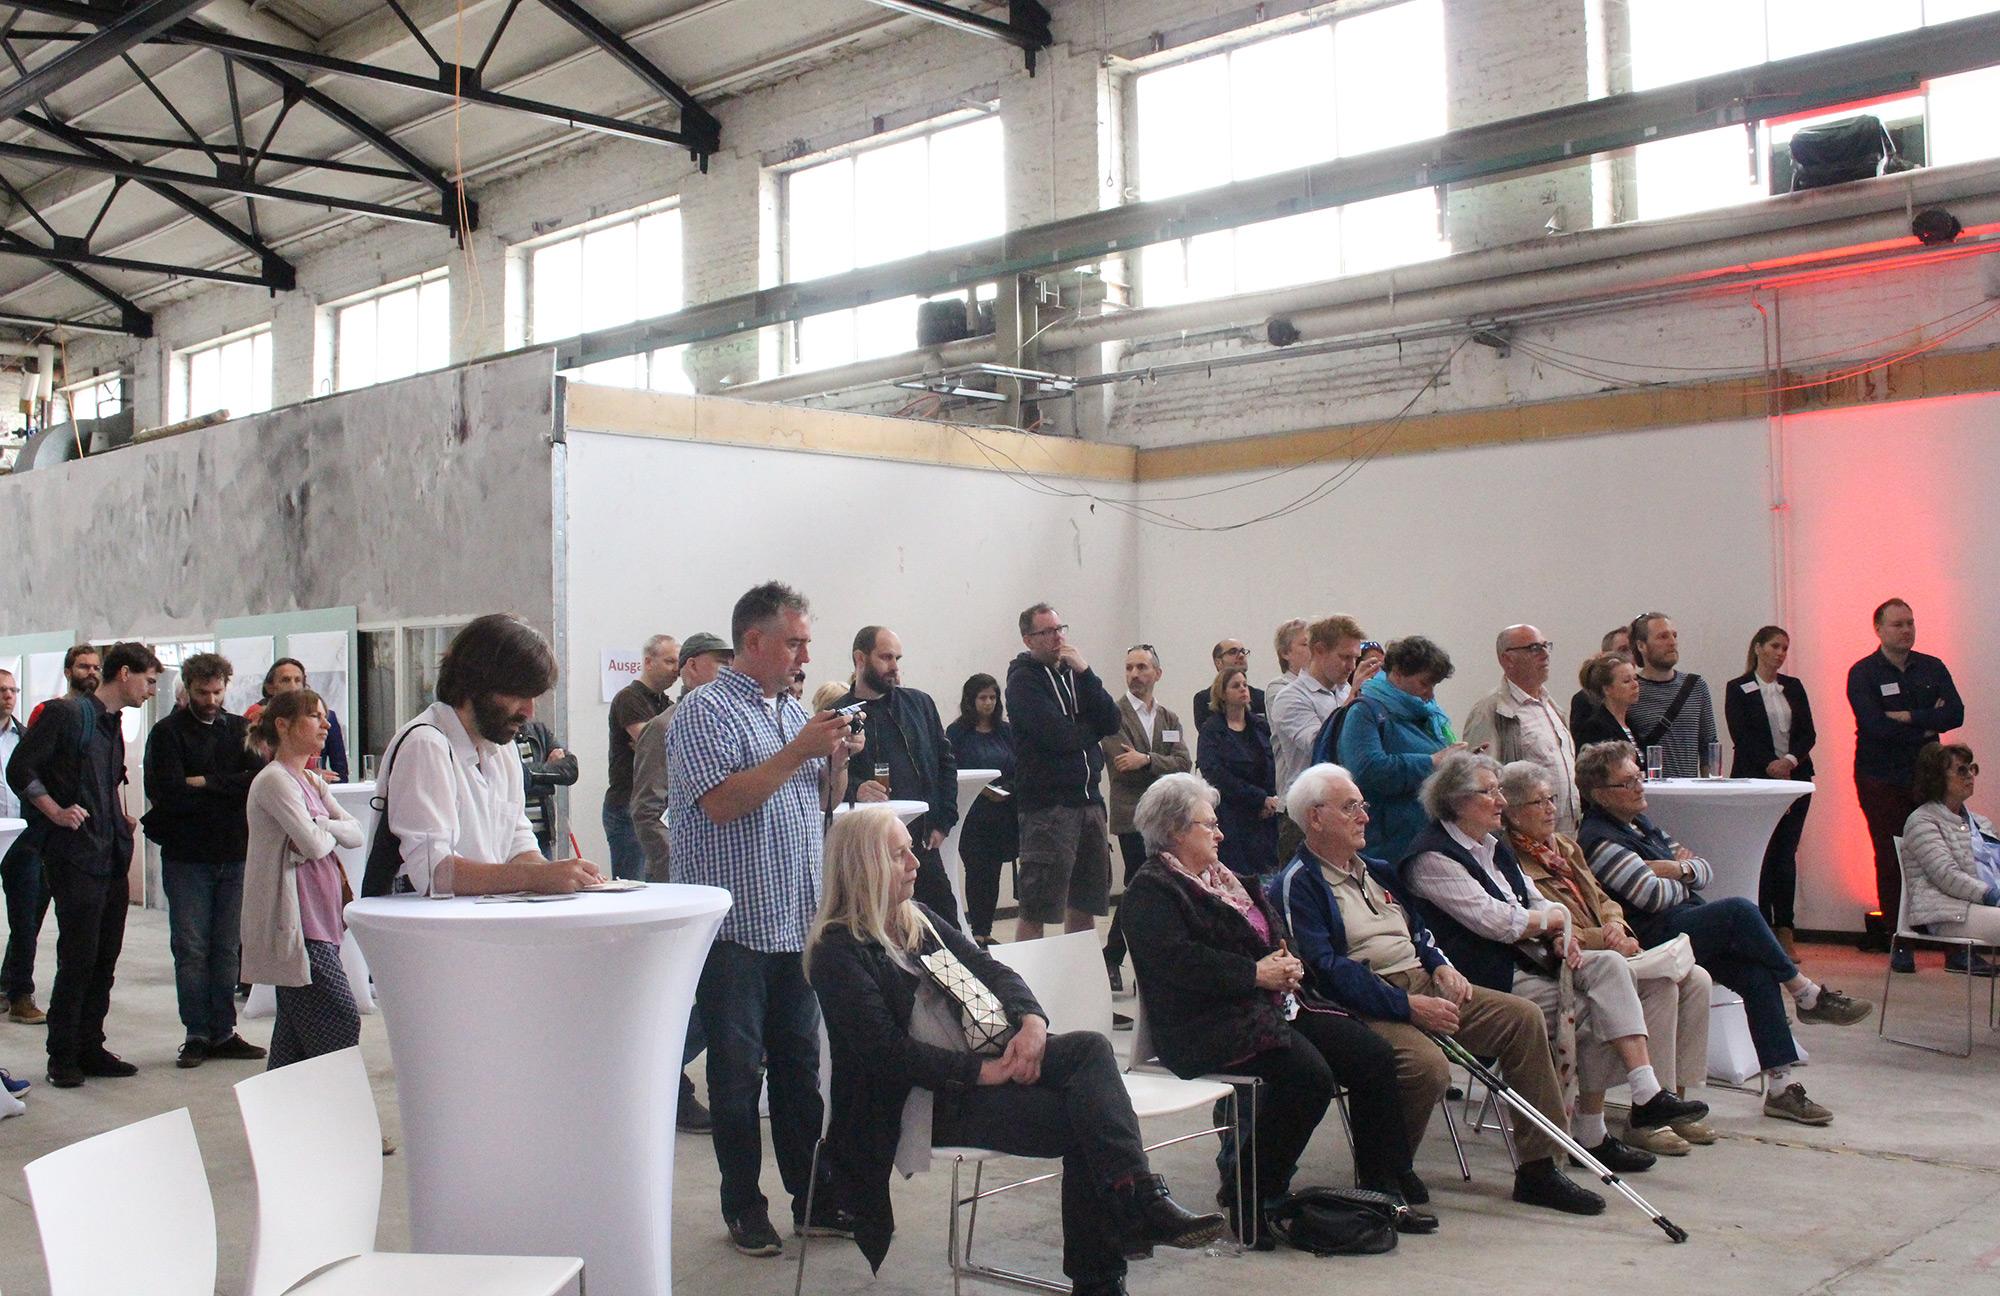 CG Gruppe stellt sich der Köln-Mülheimer Nachbarschaft vor